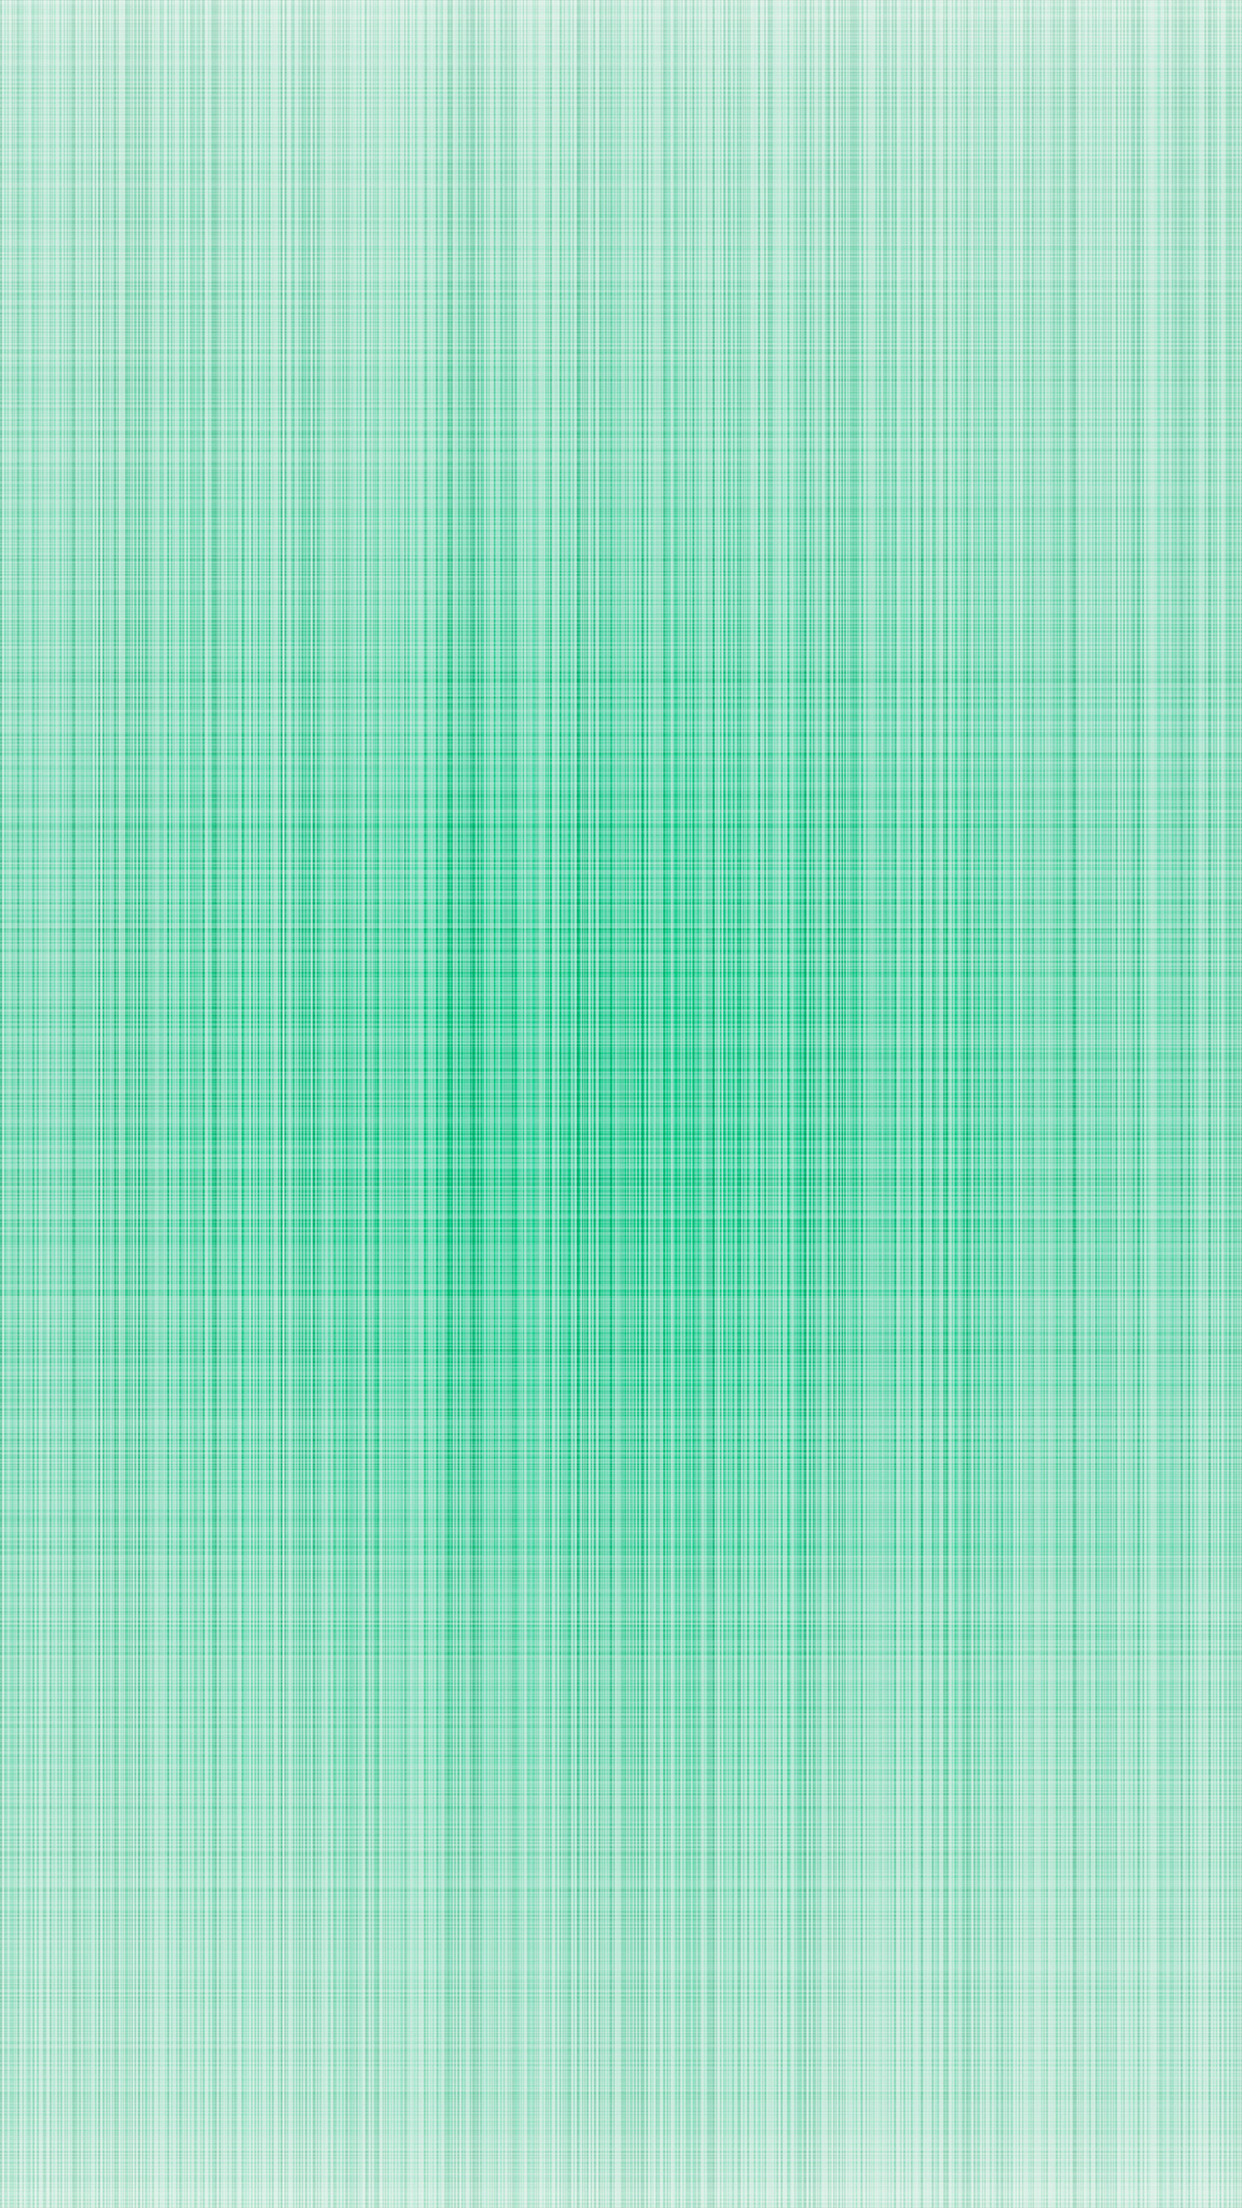 IPhone 6 Download IPad Wallpapers